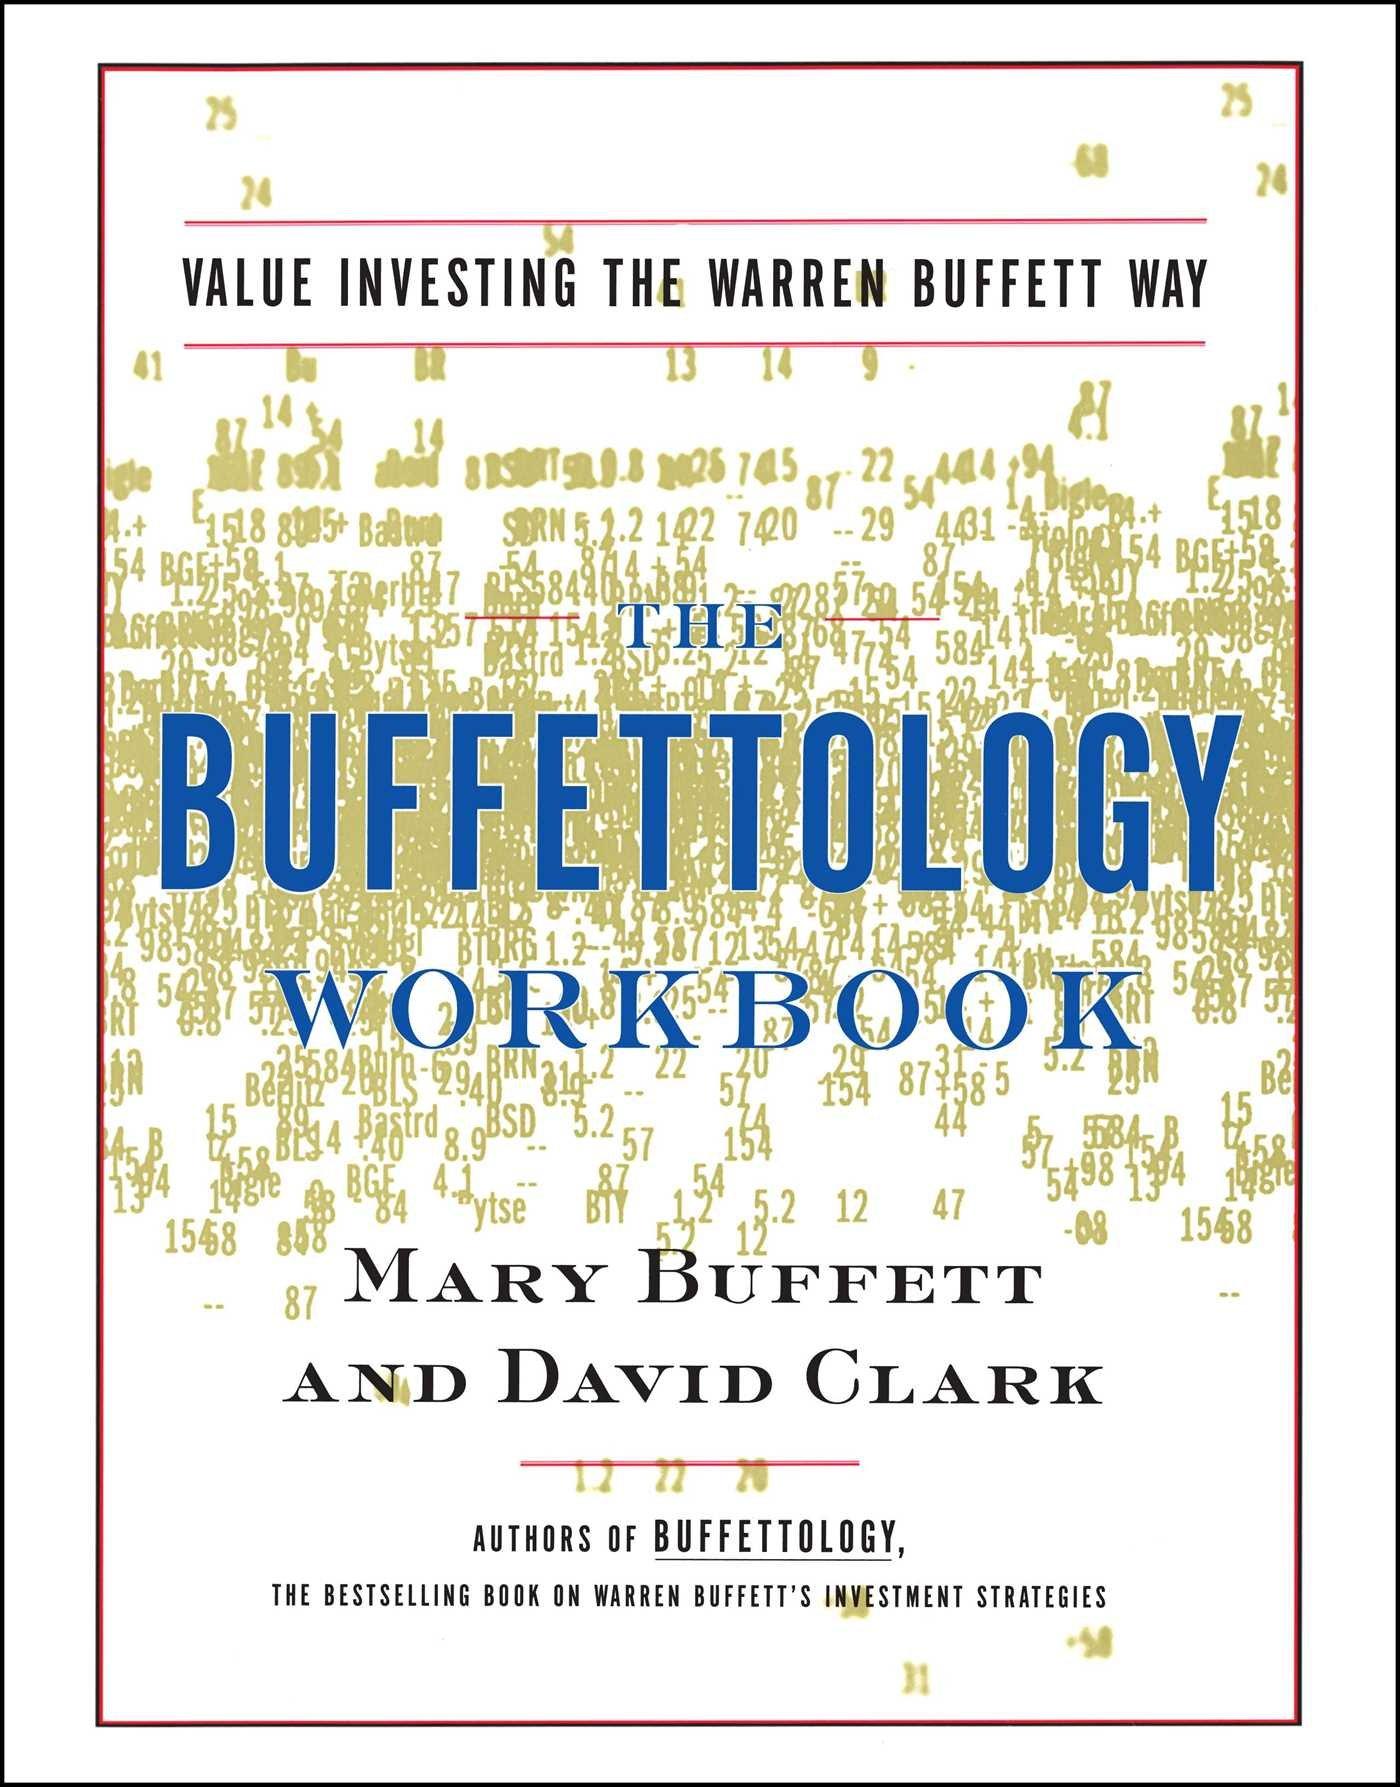 The Buffettology Workbook: Value Investing The Warren Buffett Way by Scribner